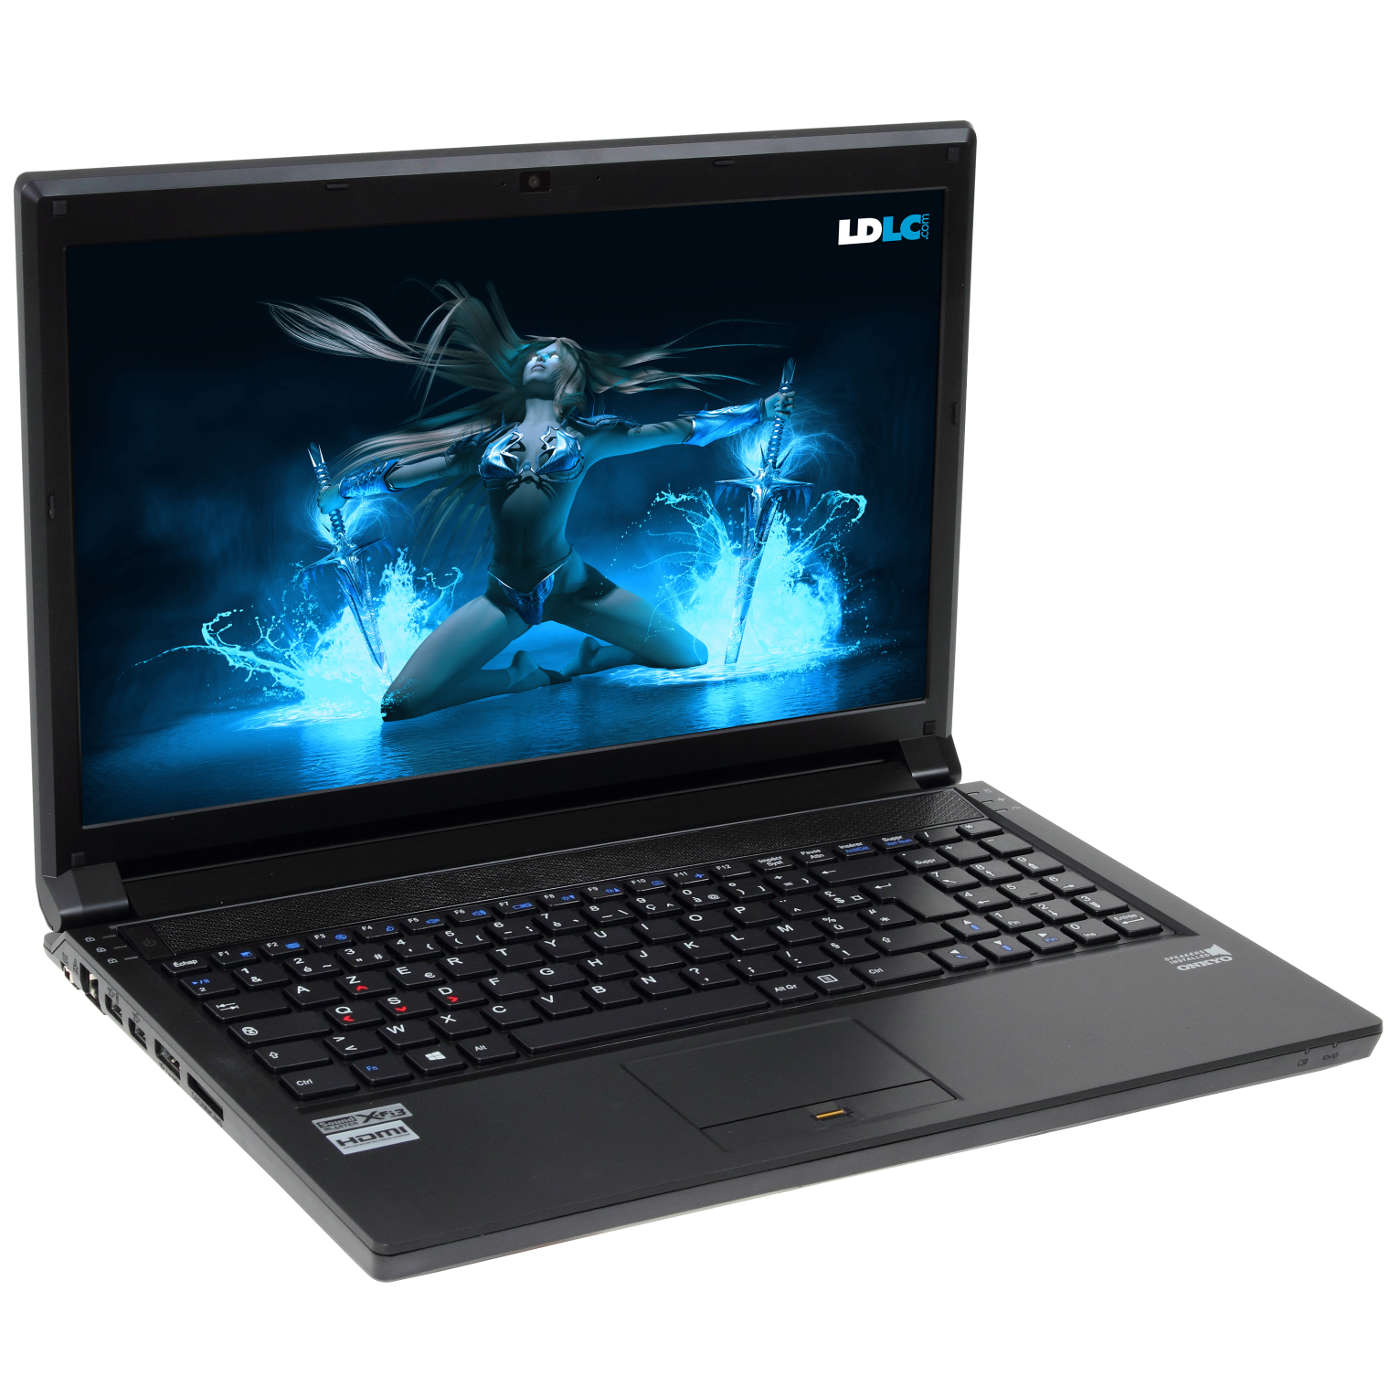 "PC portable LDLC Bellone GB3-I5-8-H10S-H7 Intel Core i5-4210M 8 Go SSHD 1 To 15.6"" LED NVIDIA GeForce GTX 860M Graveur DVD Wi-Fi N/Bluetooth Webcam Windows 7 Premium 64 bits"